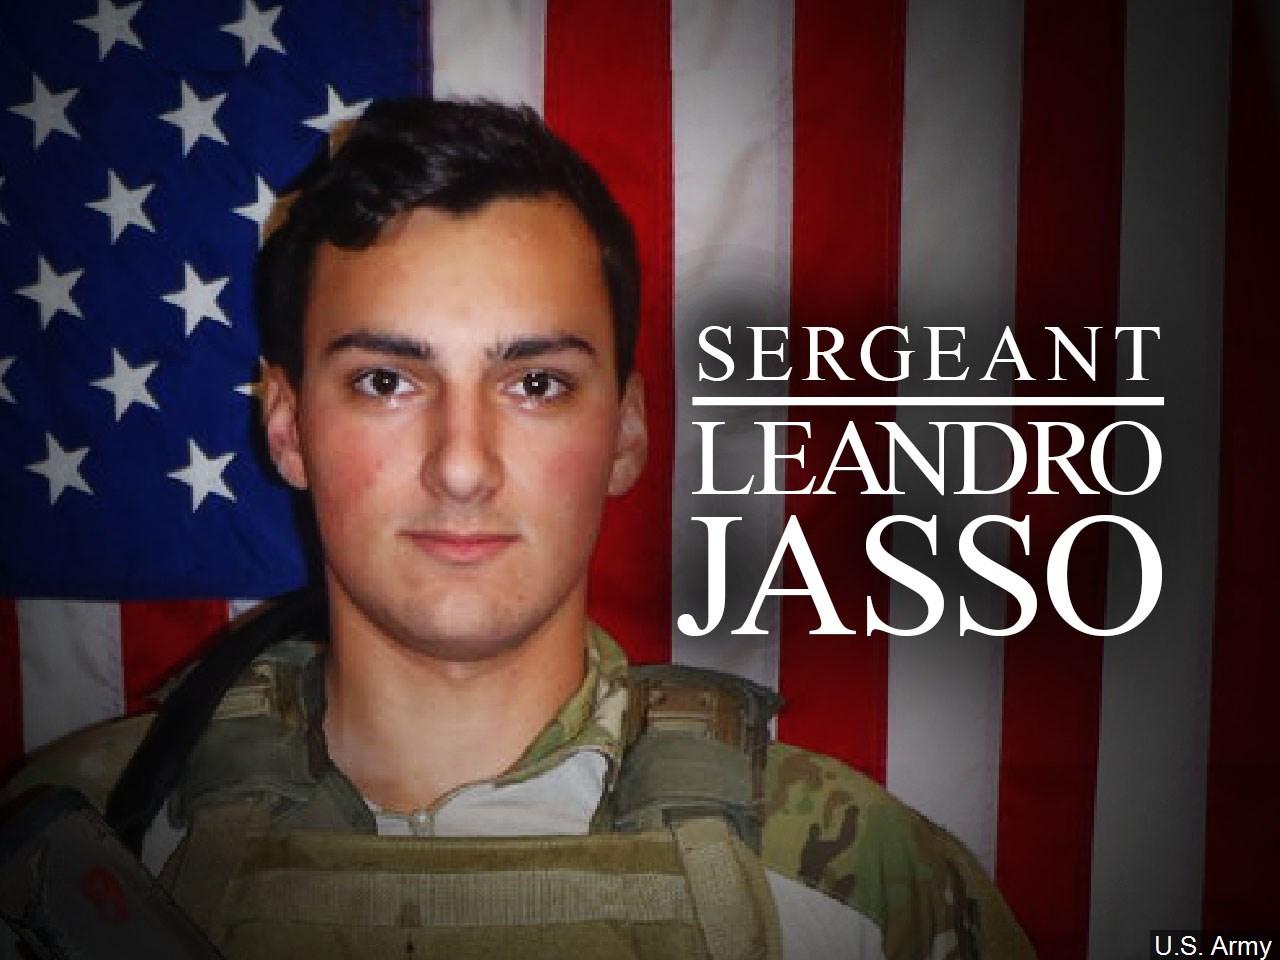 Sgt Jeandro Jasso.jpg